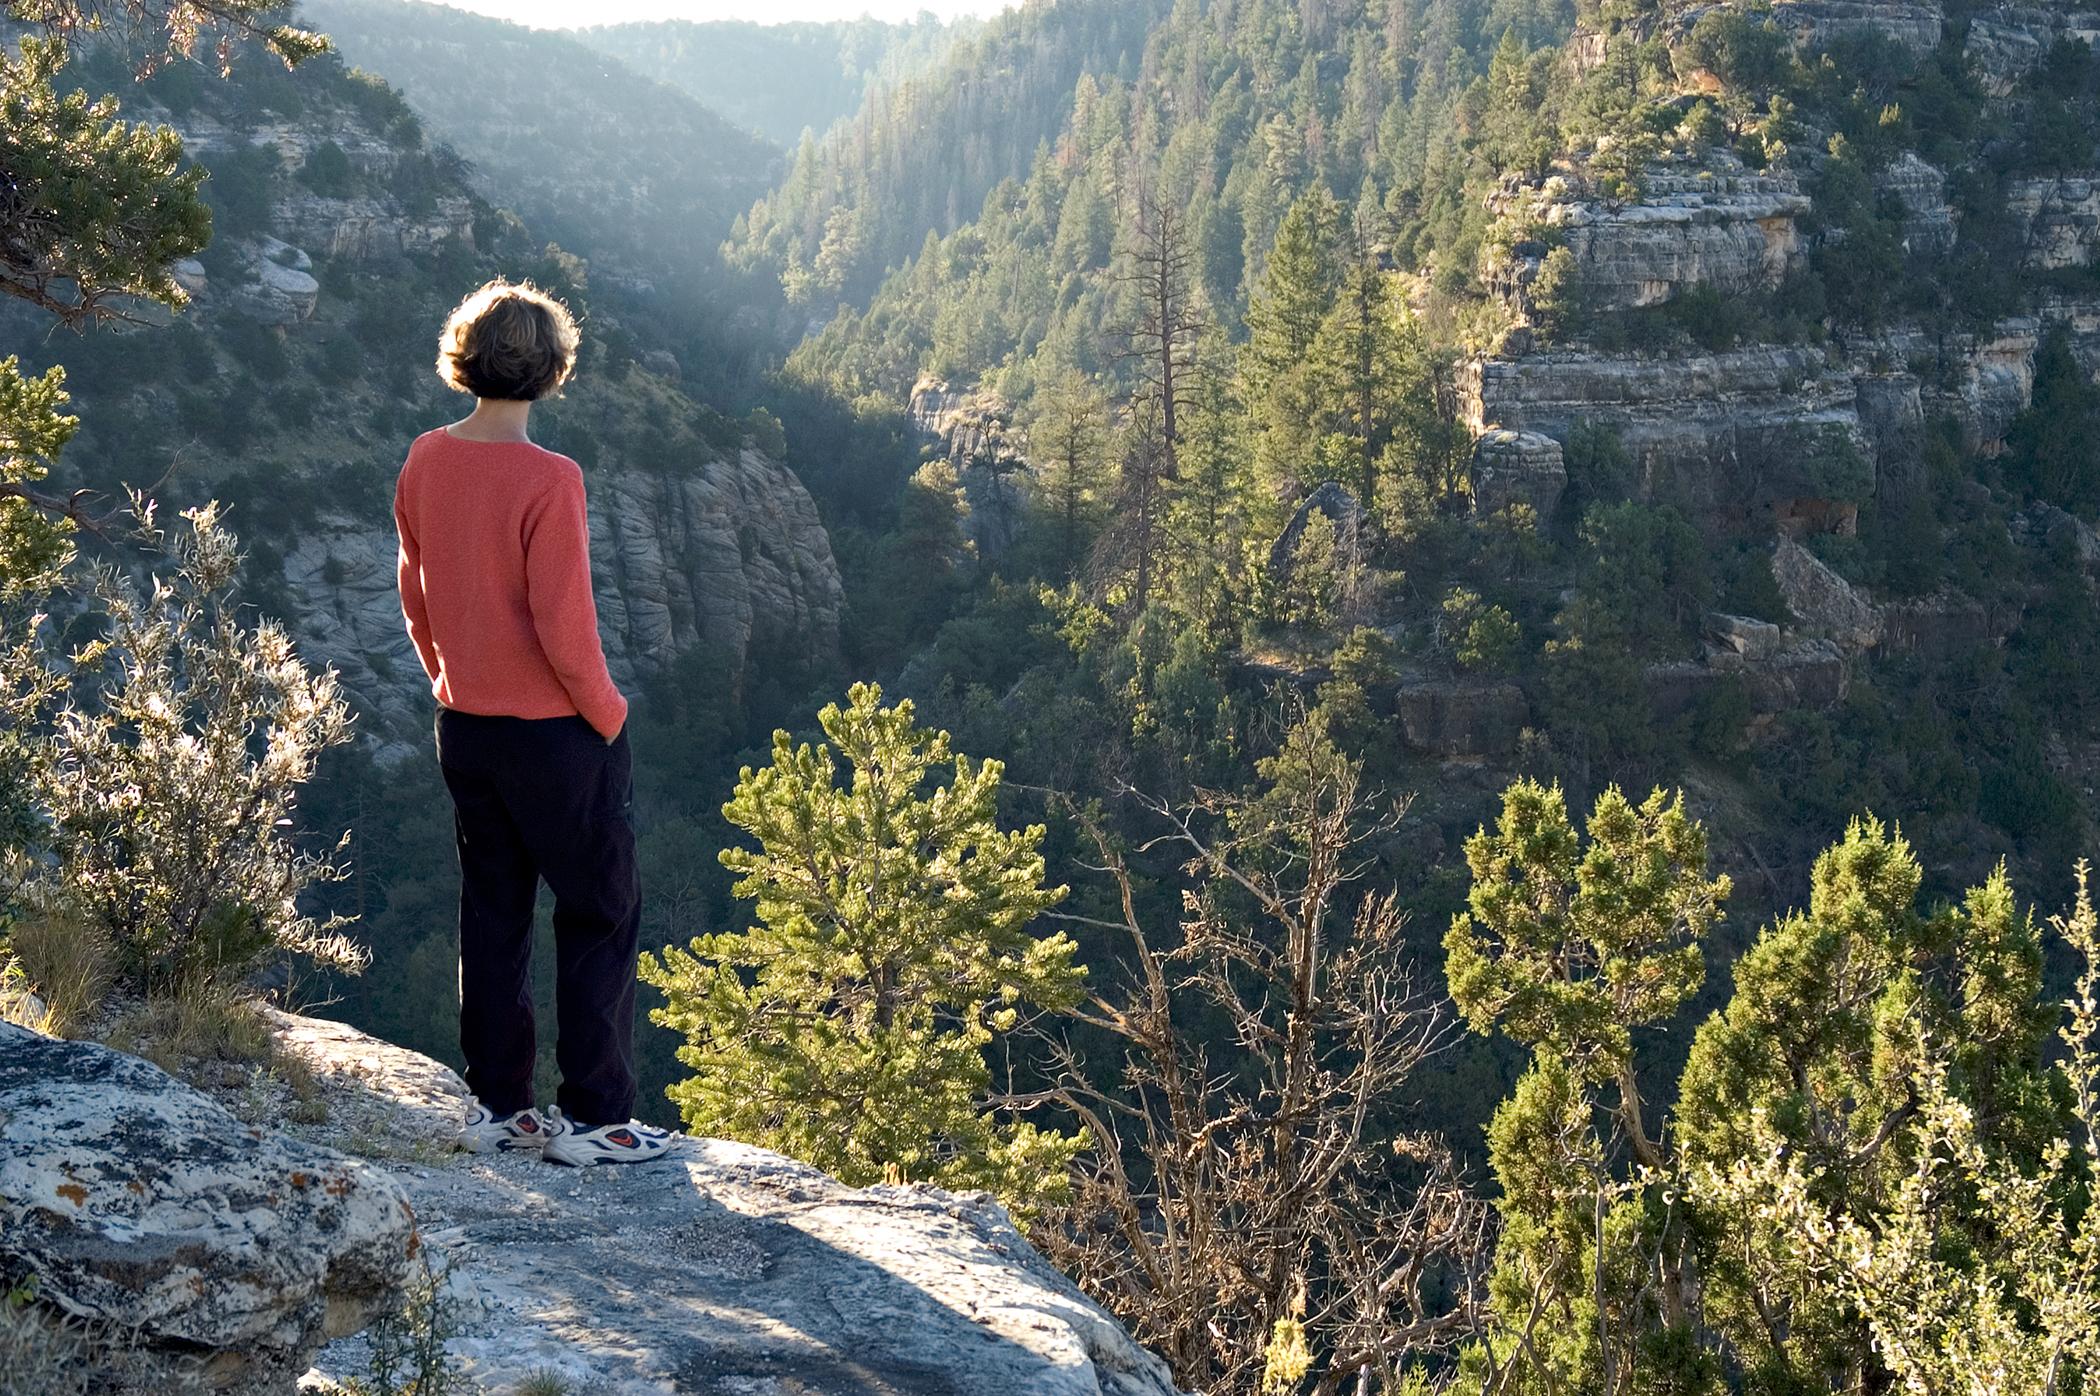 Hiker overlooking Walnut Canyon National Monuments outside of Flagstaff, Arizona